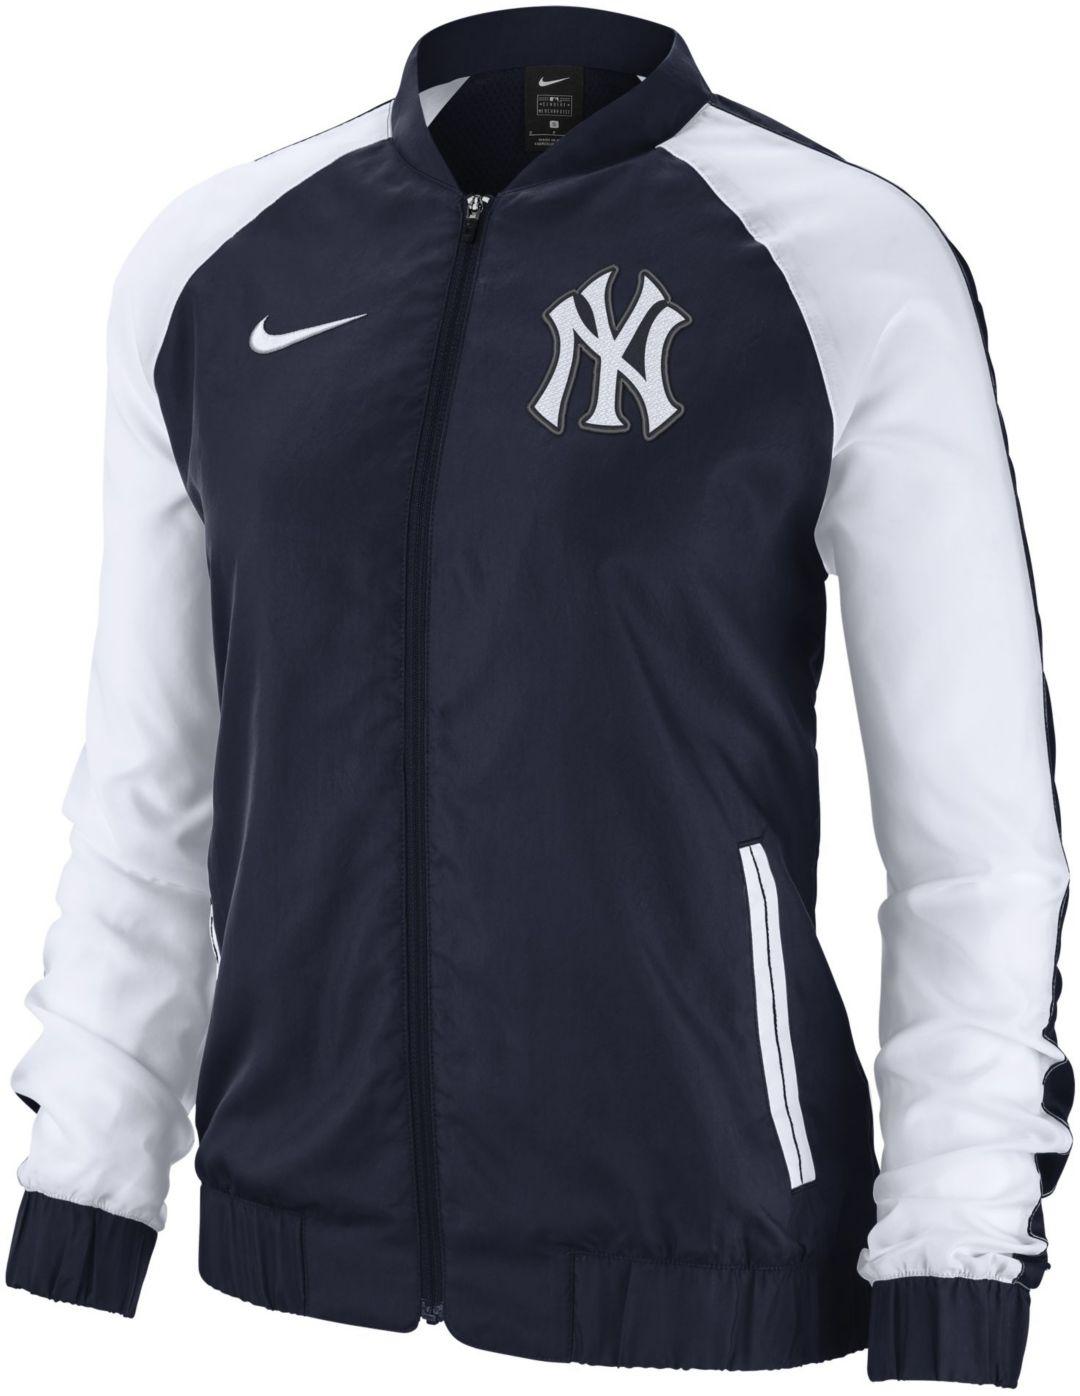 a6c2a6c8a Nike Women's New York Yankees Dri-FIT Full-Zip Varsity Jacket ...